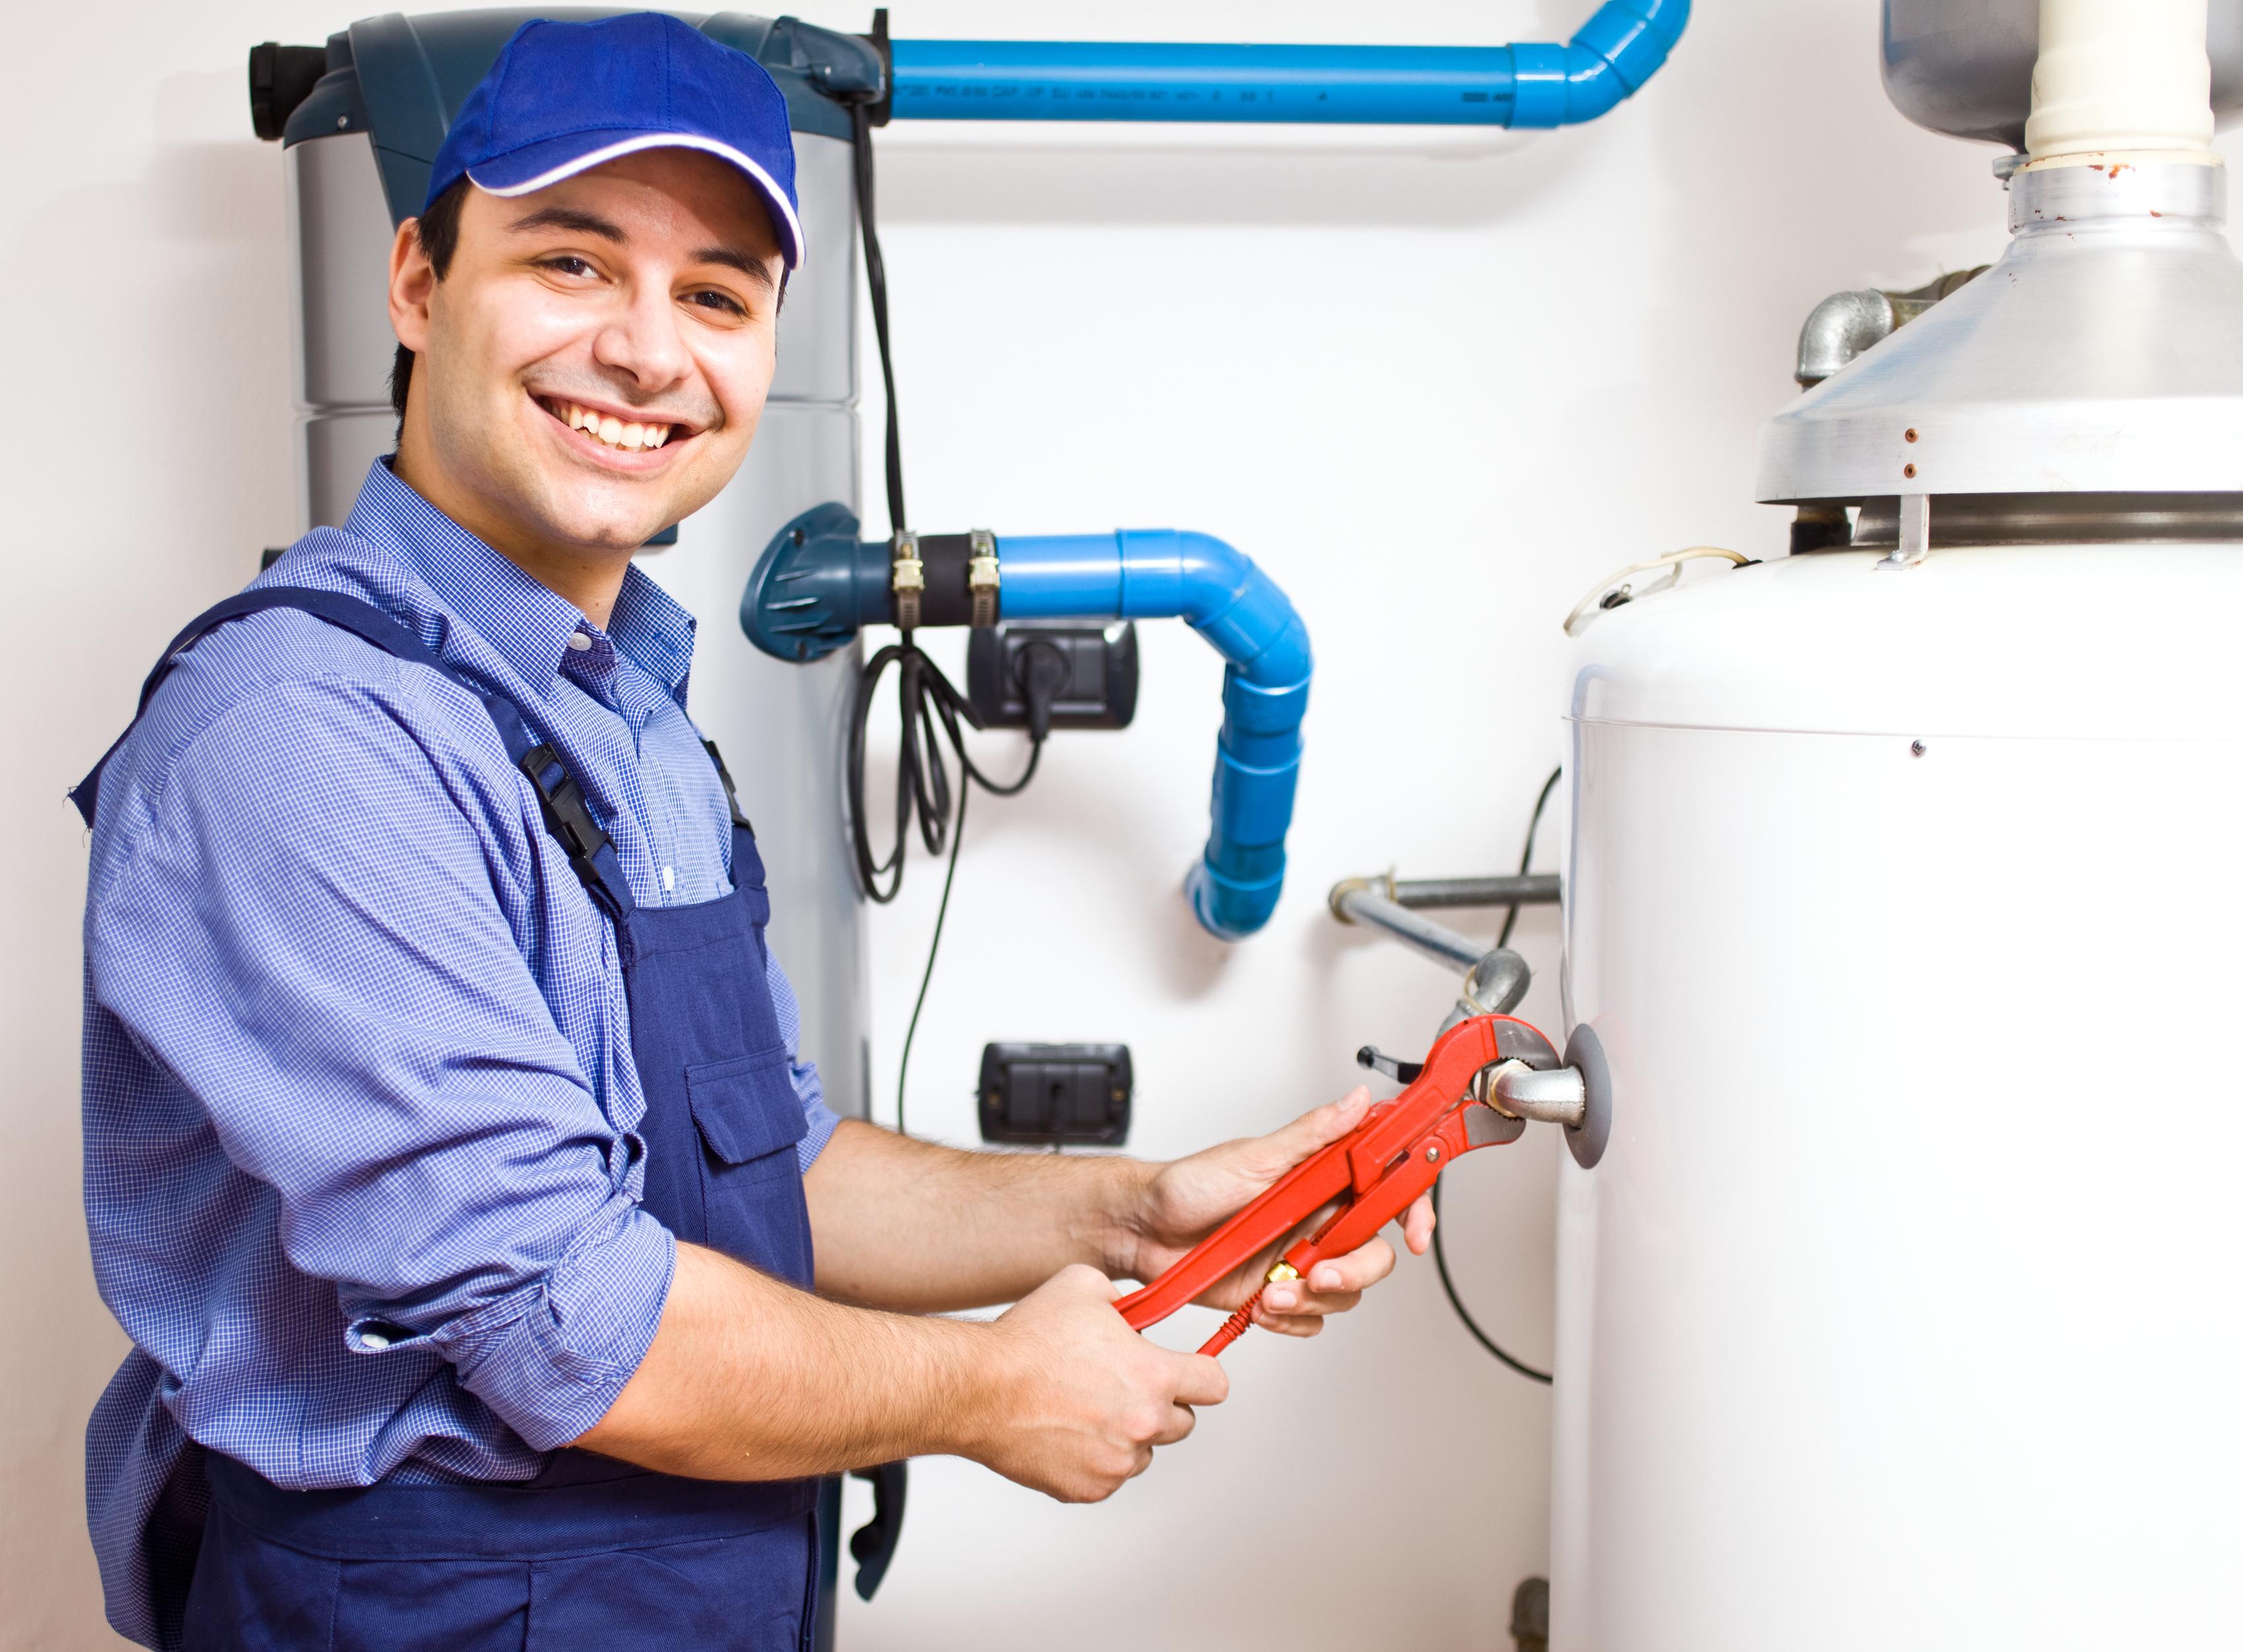 A repairman fixing a water heater